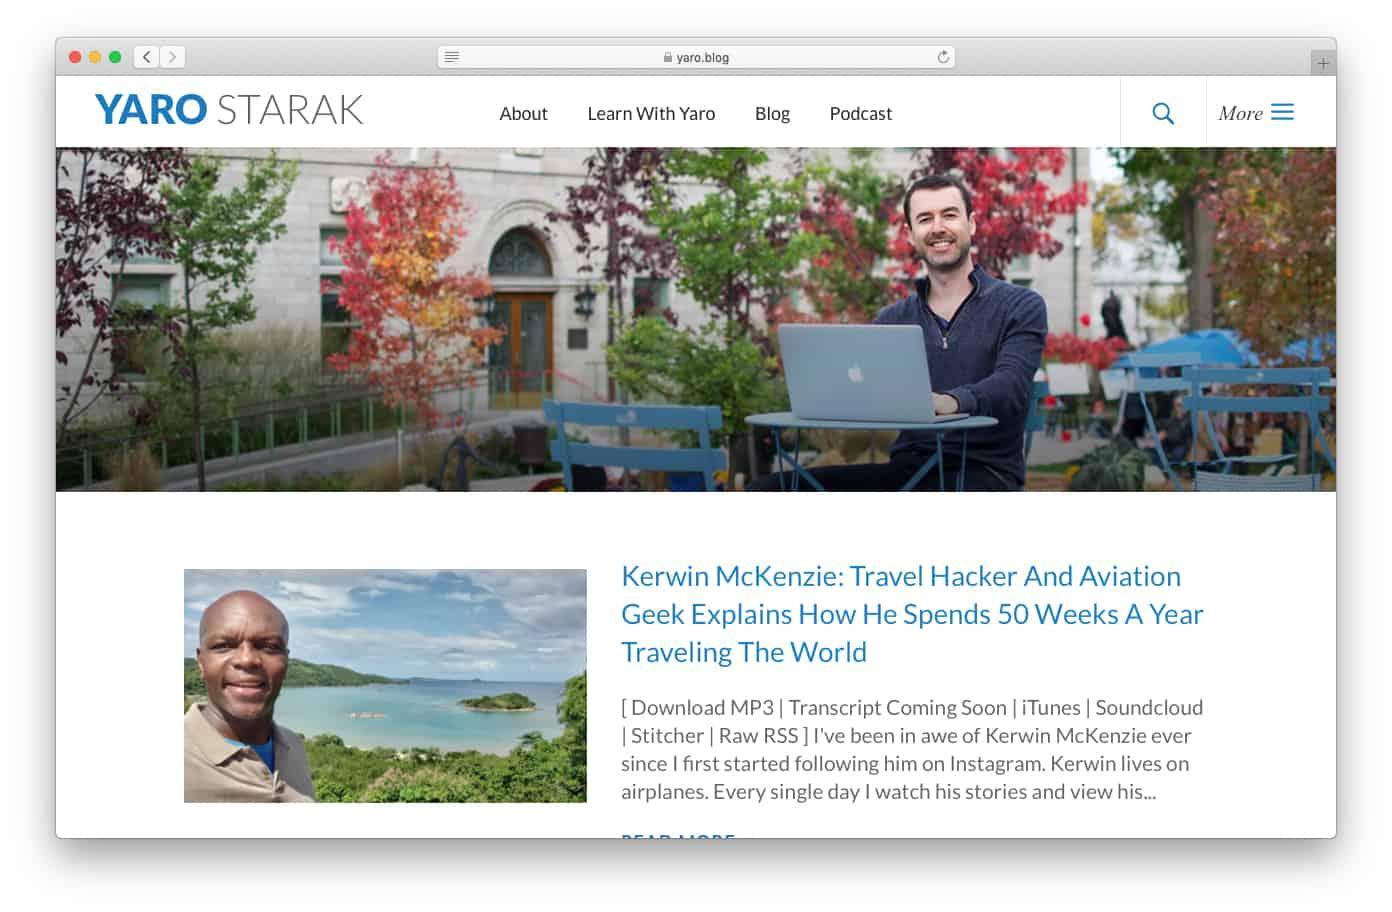 Yaro Starak Blog